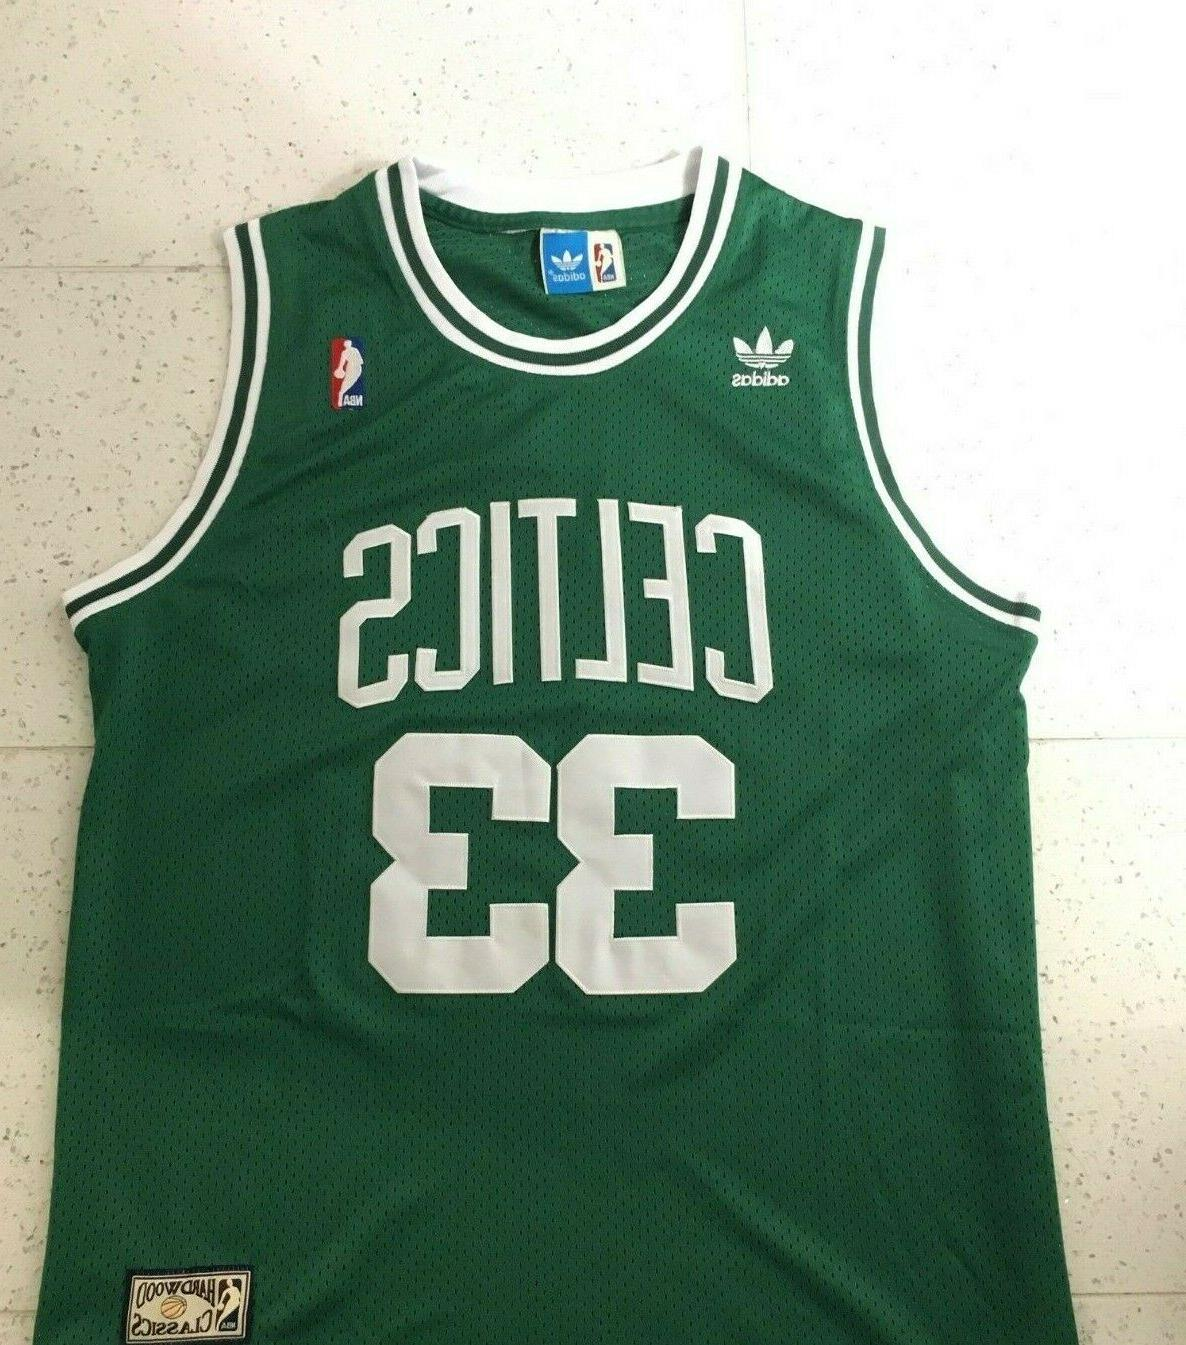 larry bird vintage boston celtics basketball jersey